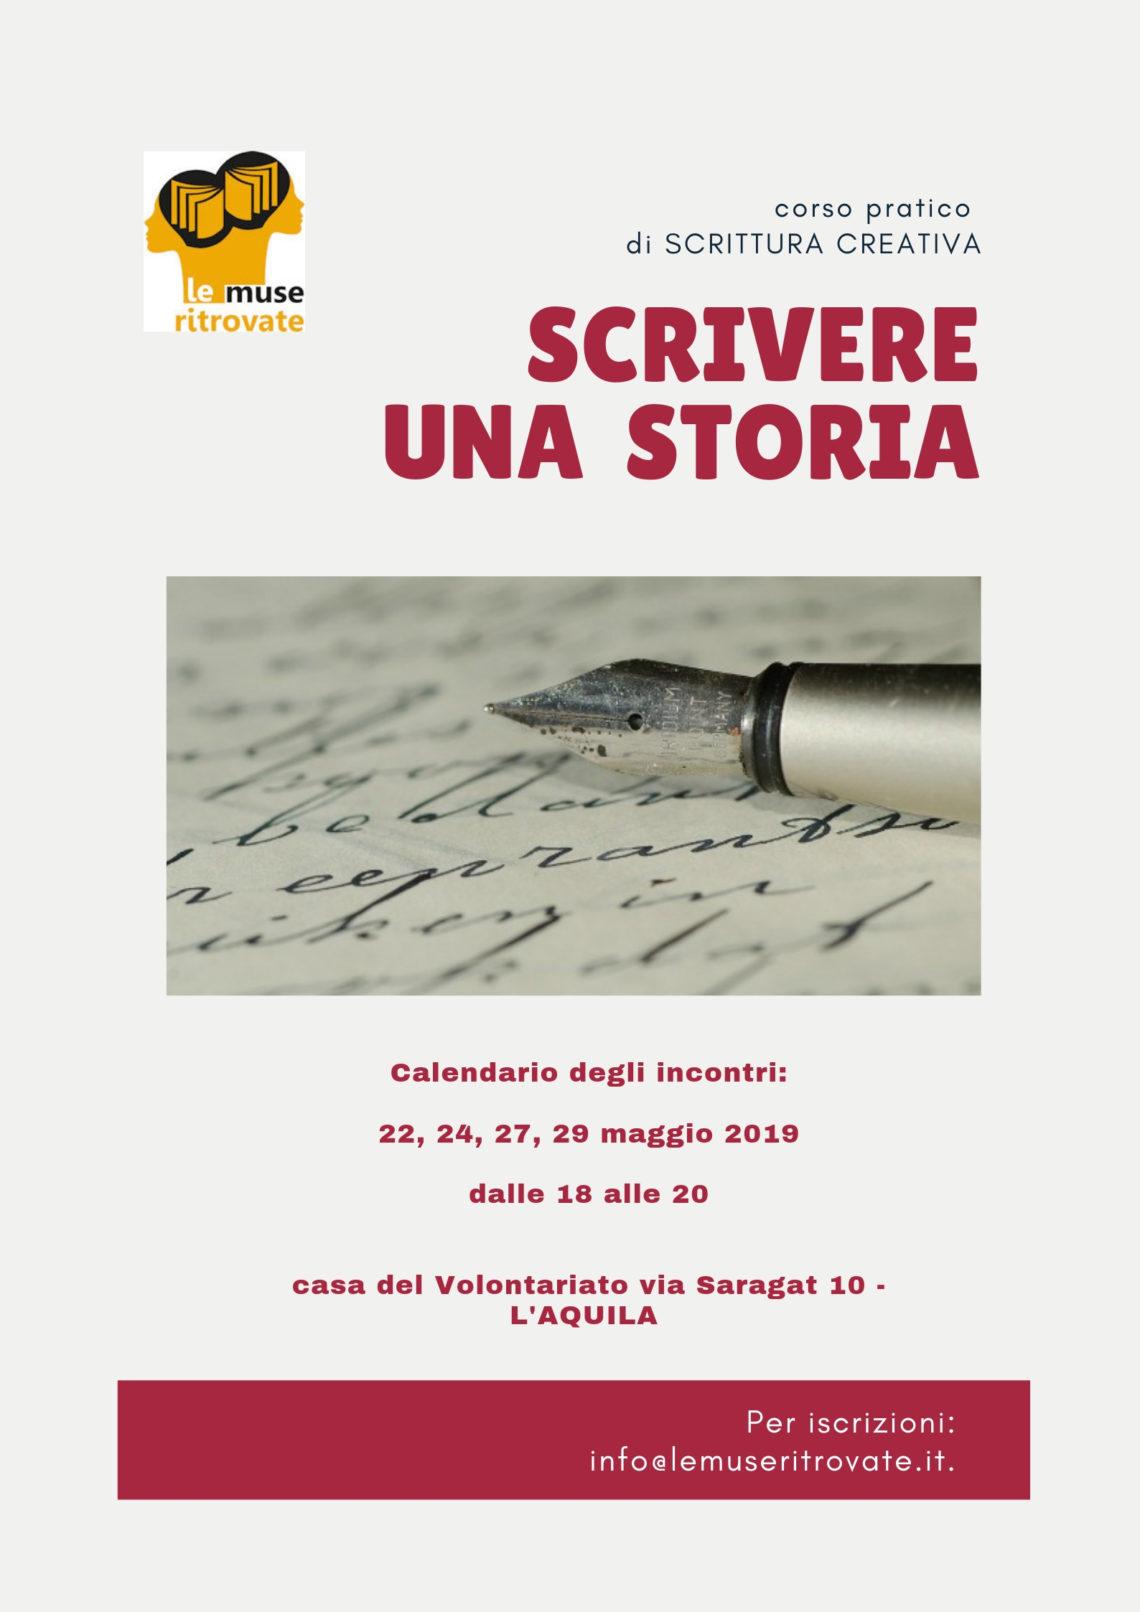 Scrivere una storia